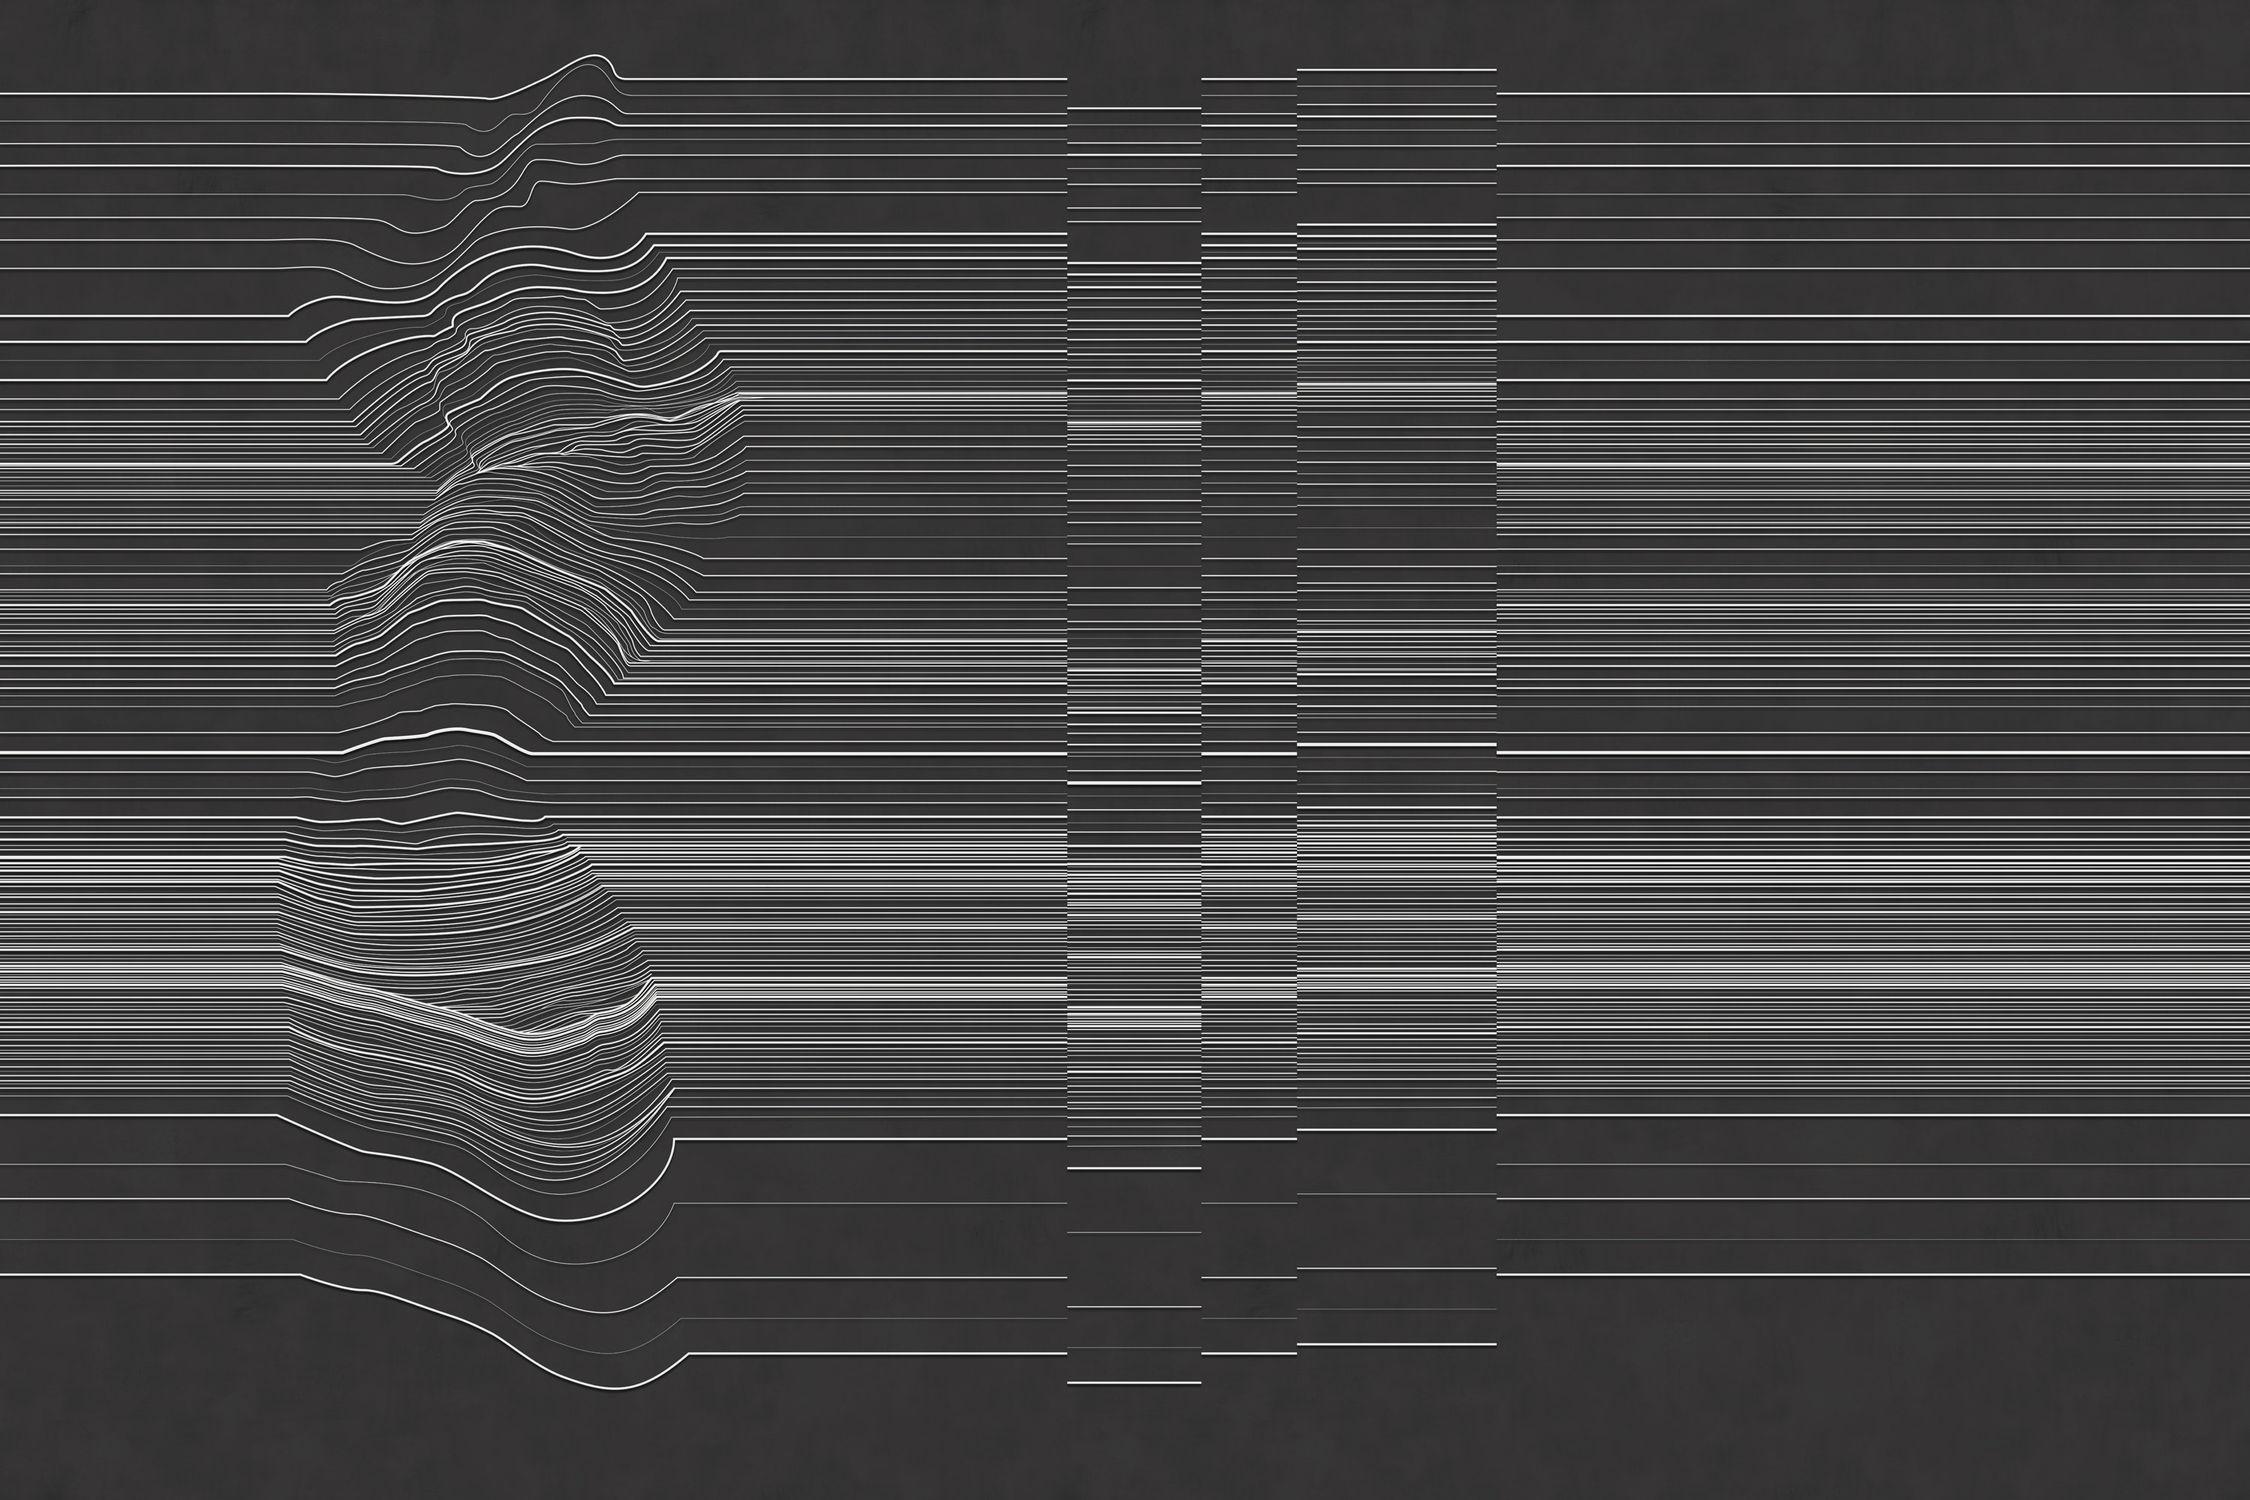 Contemporary Wallpaper Vinyl Striped 3D Effect BORDERLINE